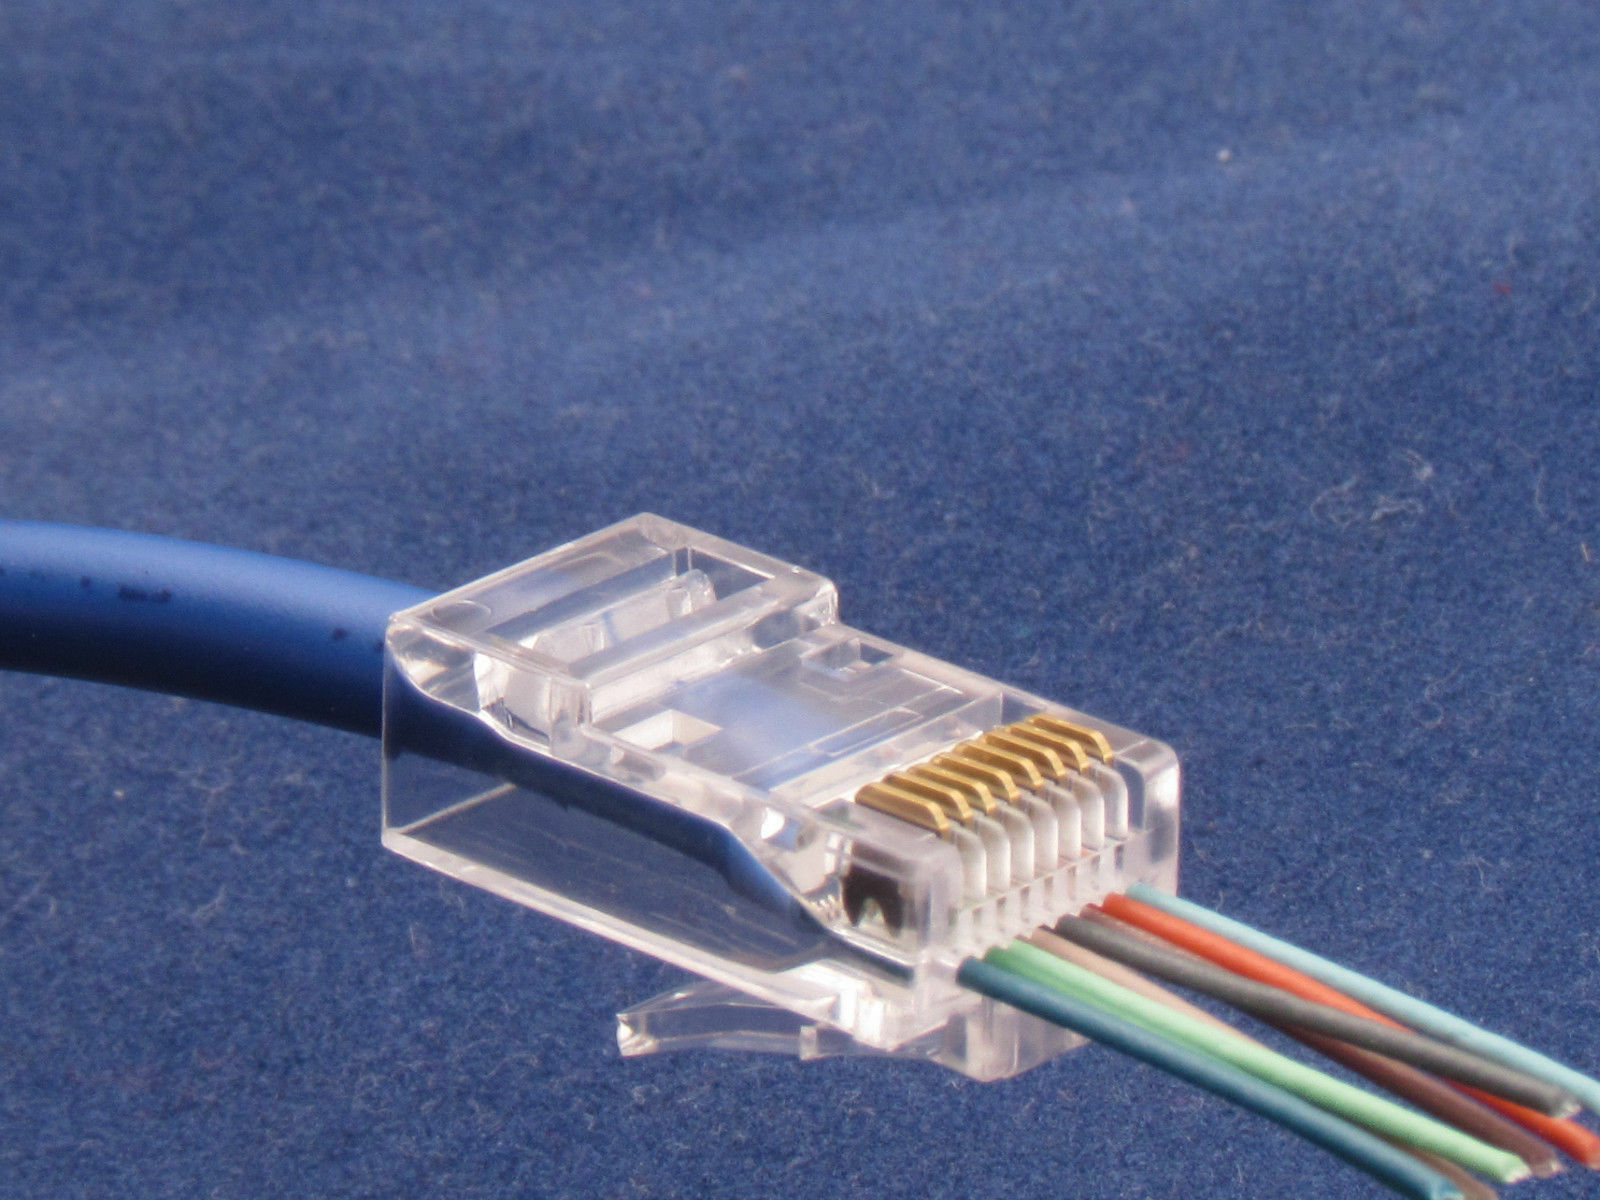 500 Pcs Cat6 Plug Ez Rj45 Network Cable Modular 8p8c Connector End Cat 6 Norton Secured Powered By Verisign